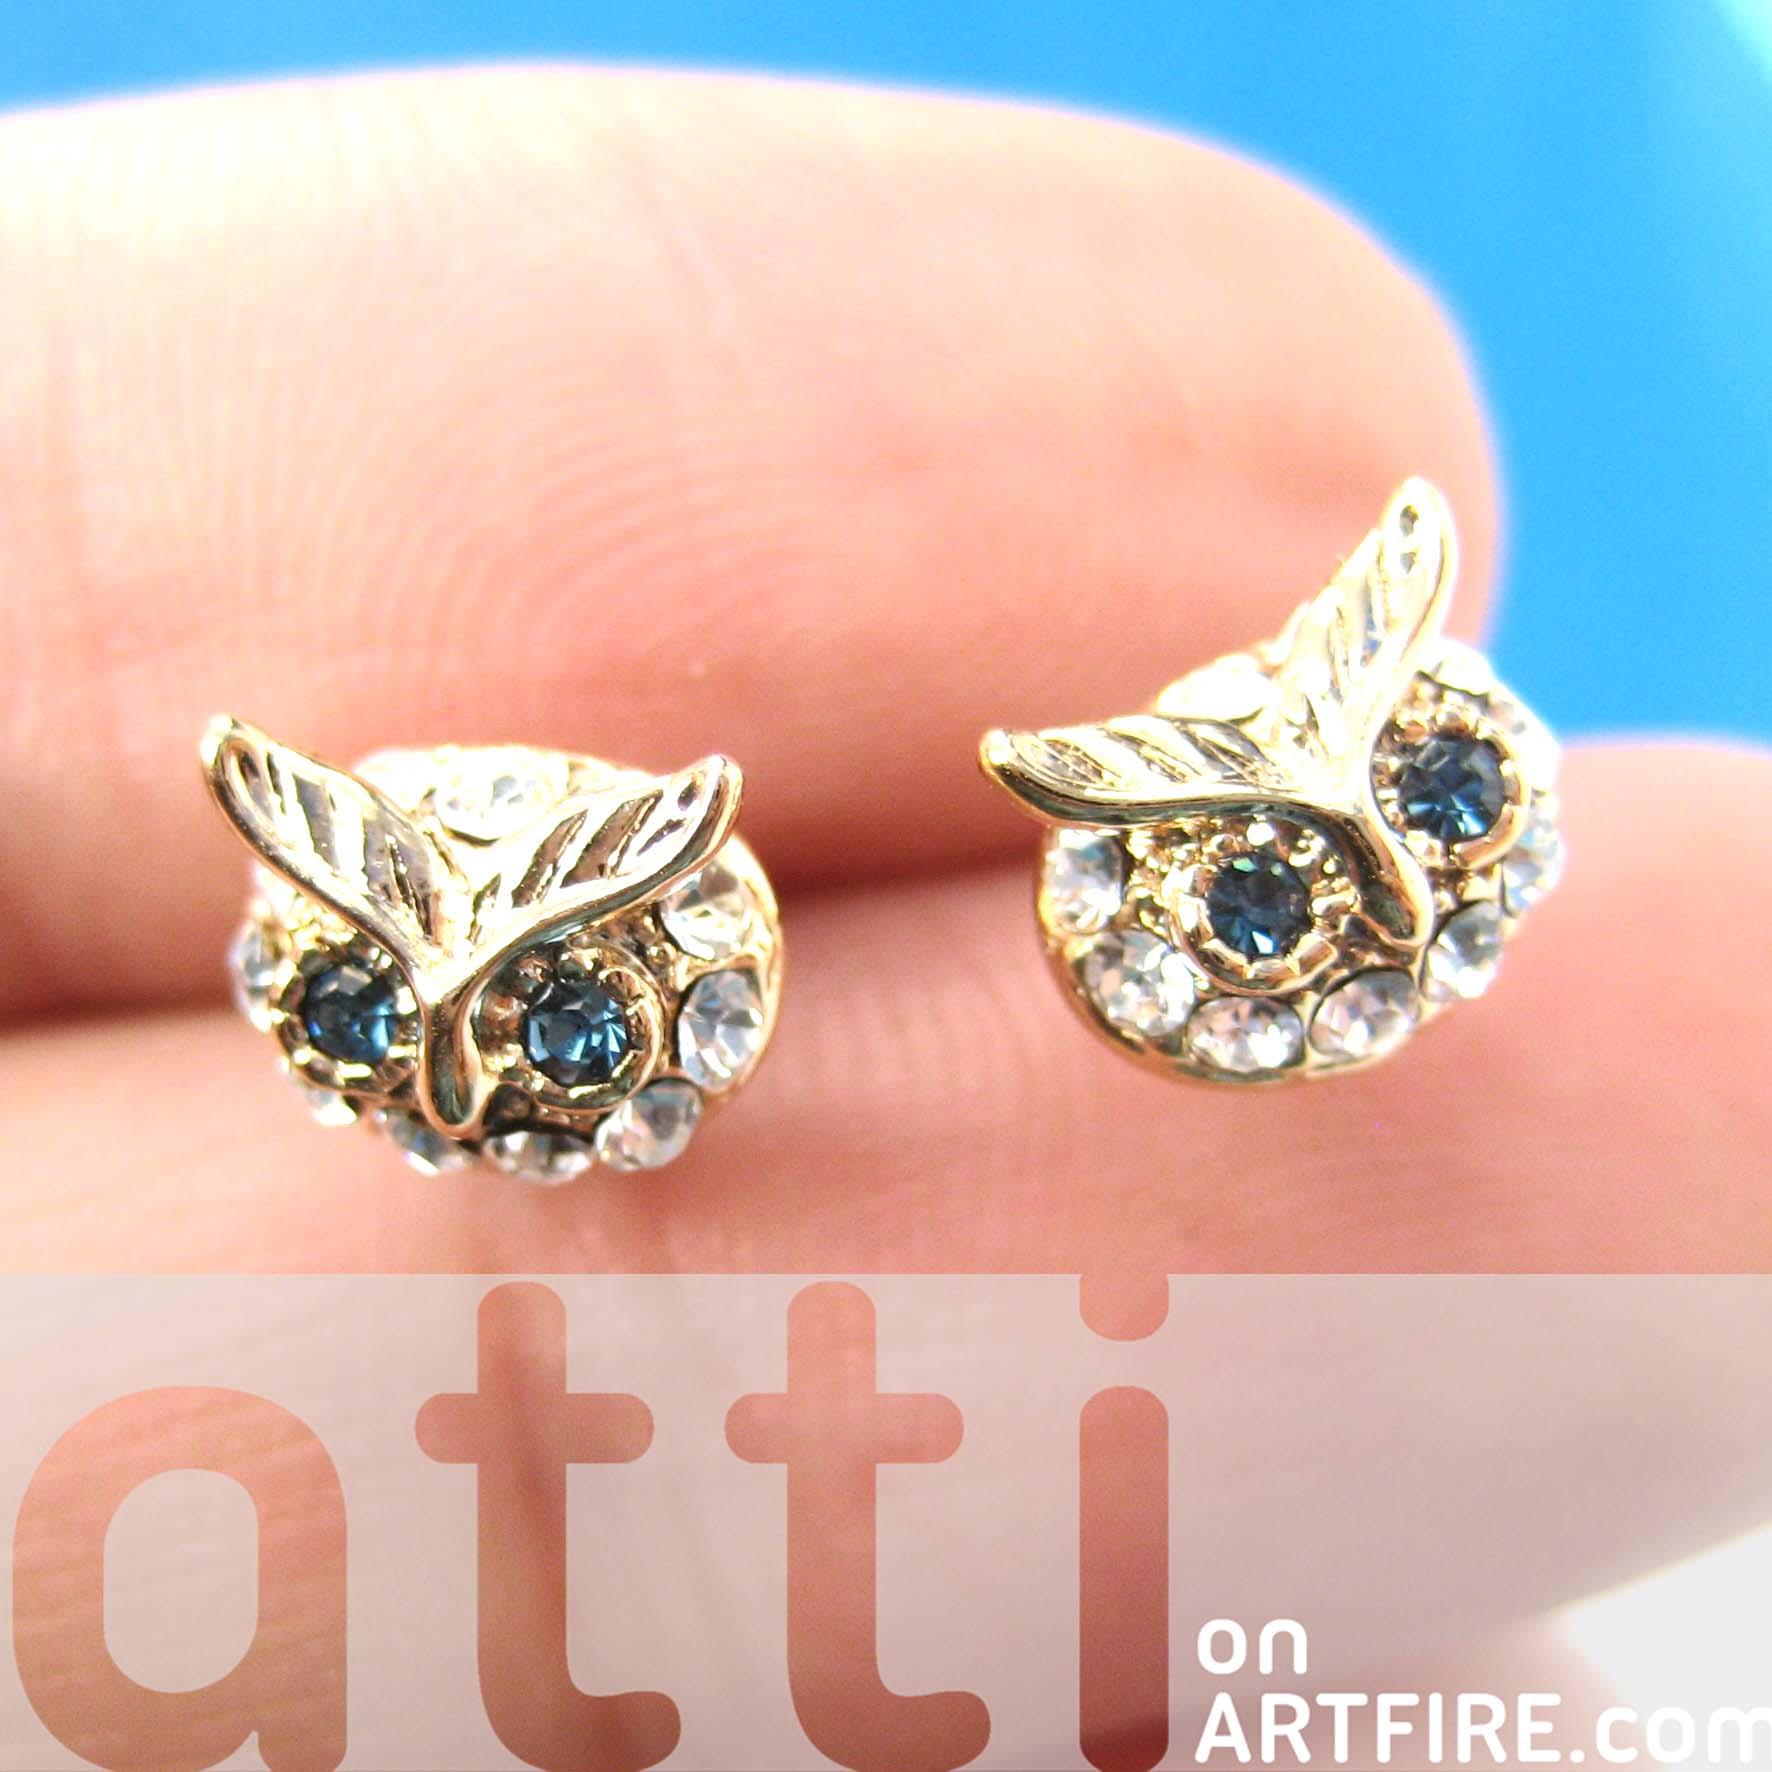 Turtle cartilage earrings